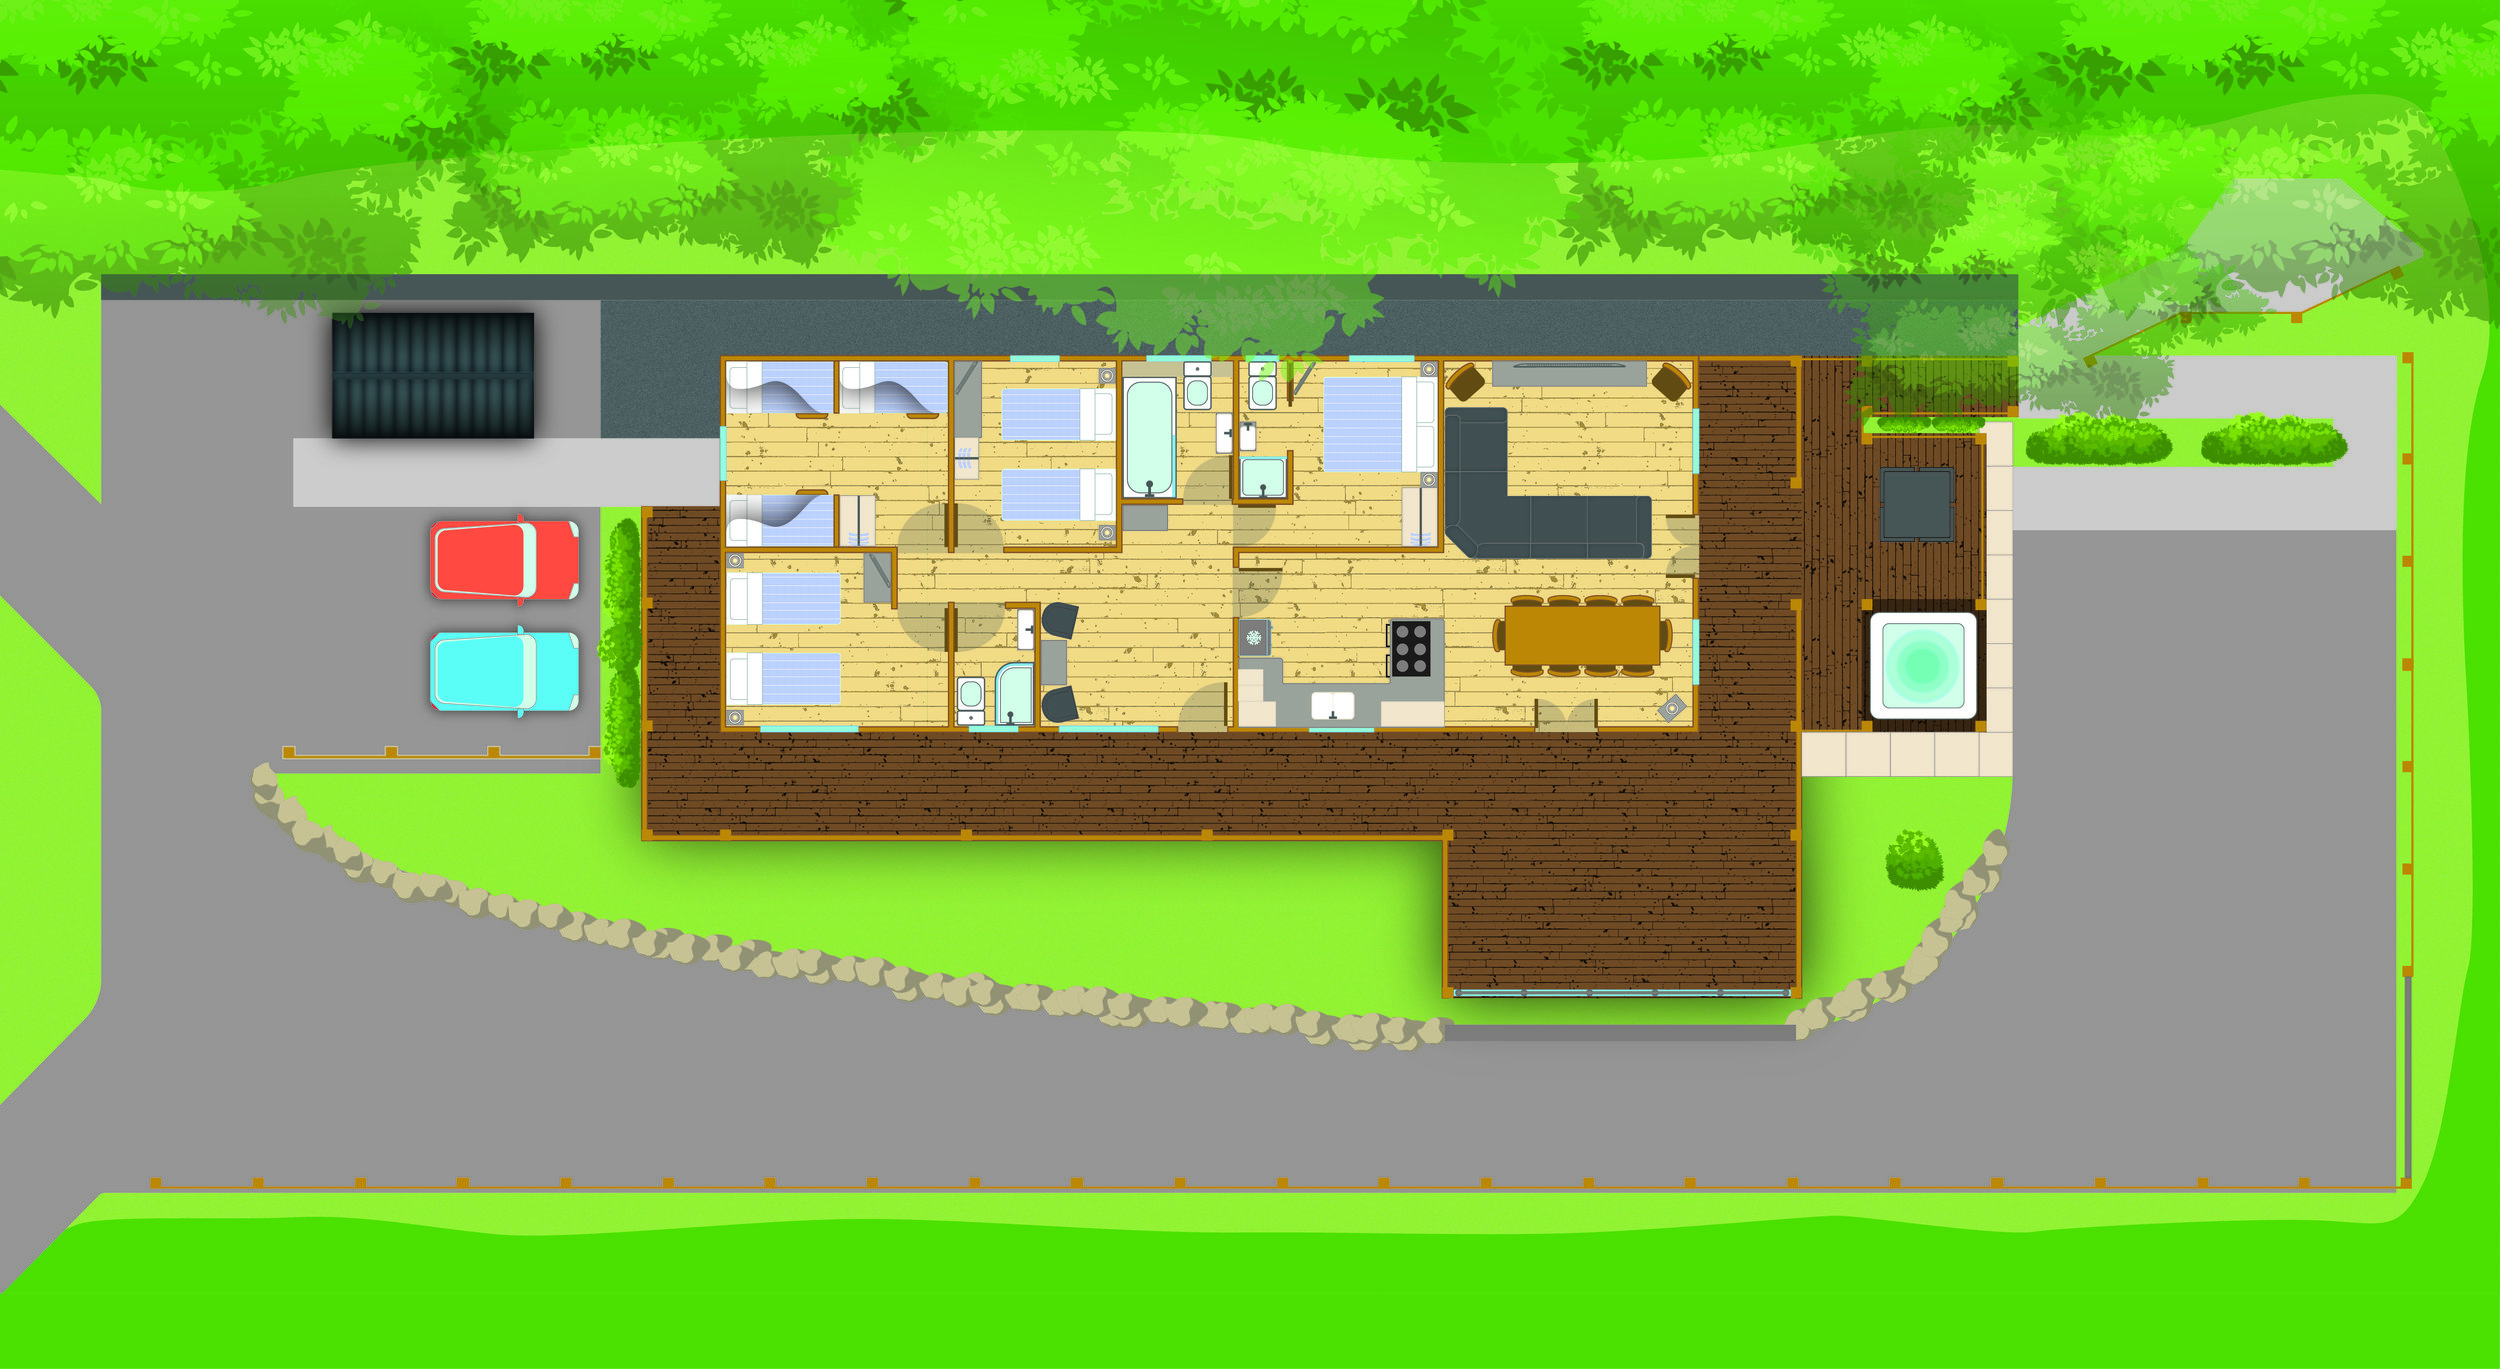 Meadow Lodge Floorplan